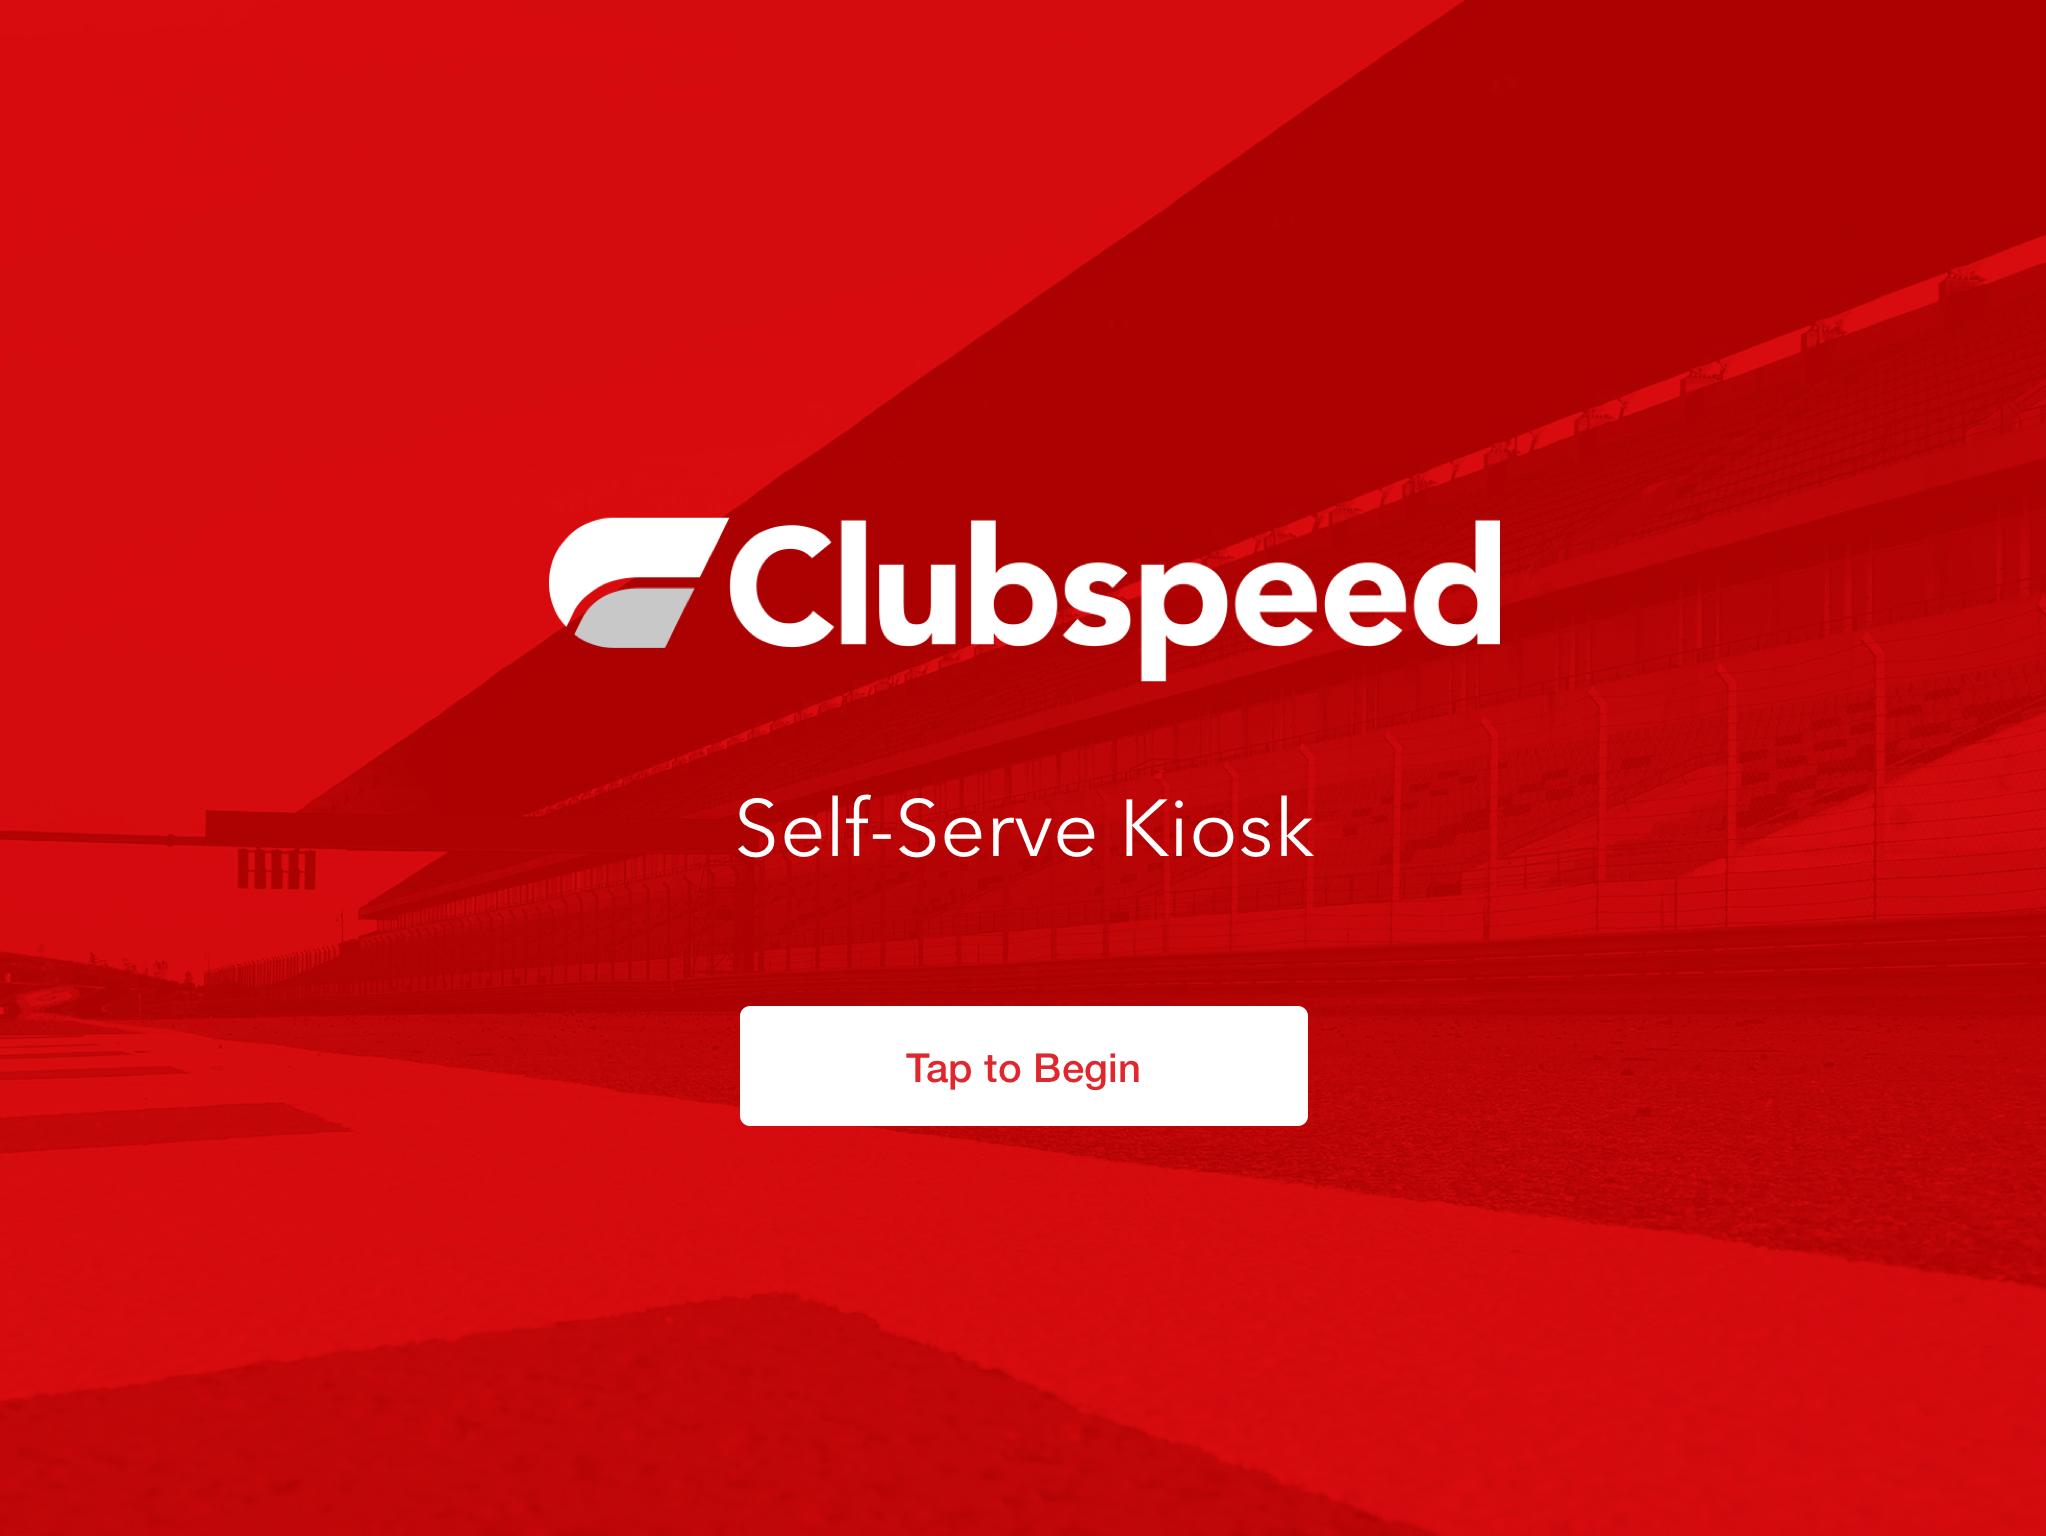 Clubspeed's Self-Service Kiosk